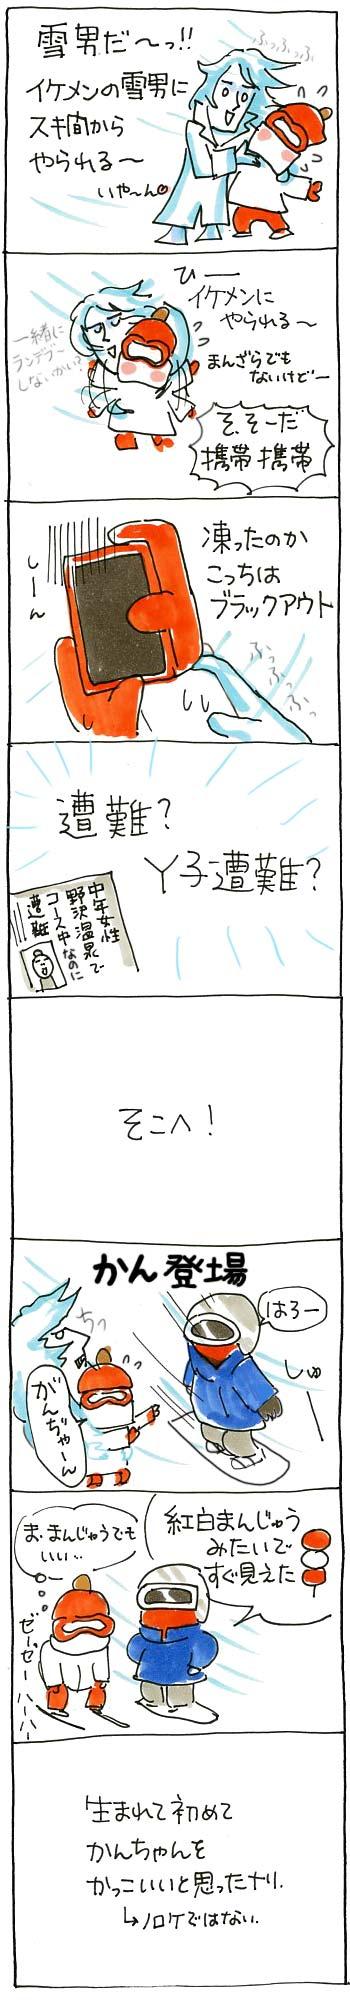 Ysuki02.jpg